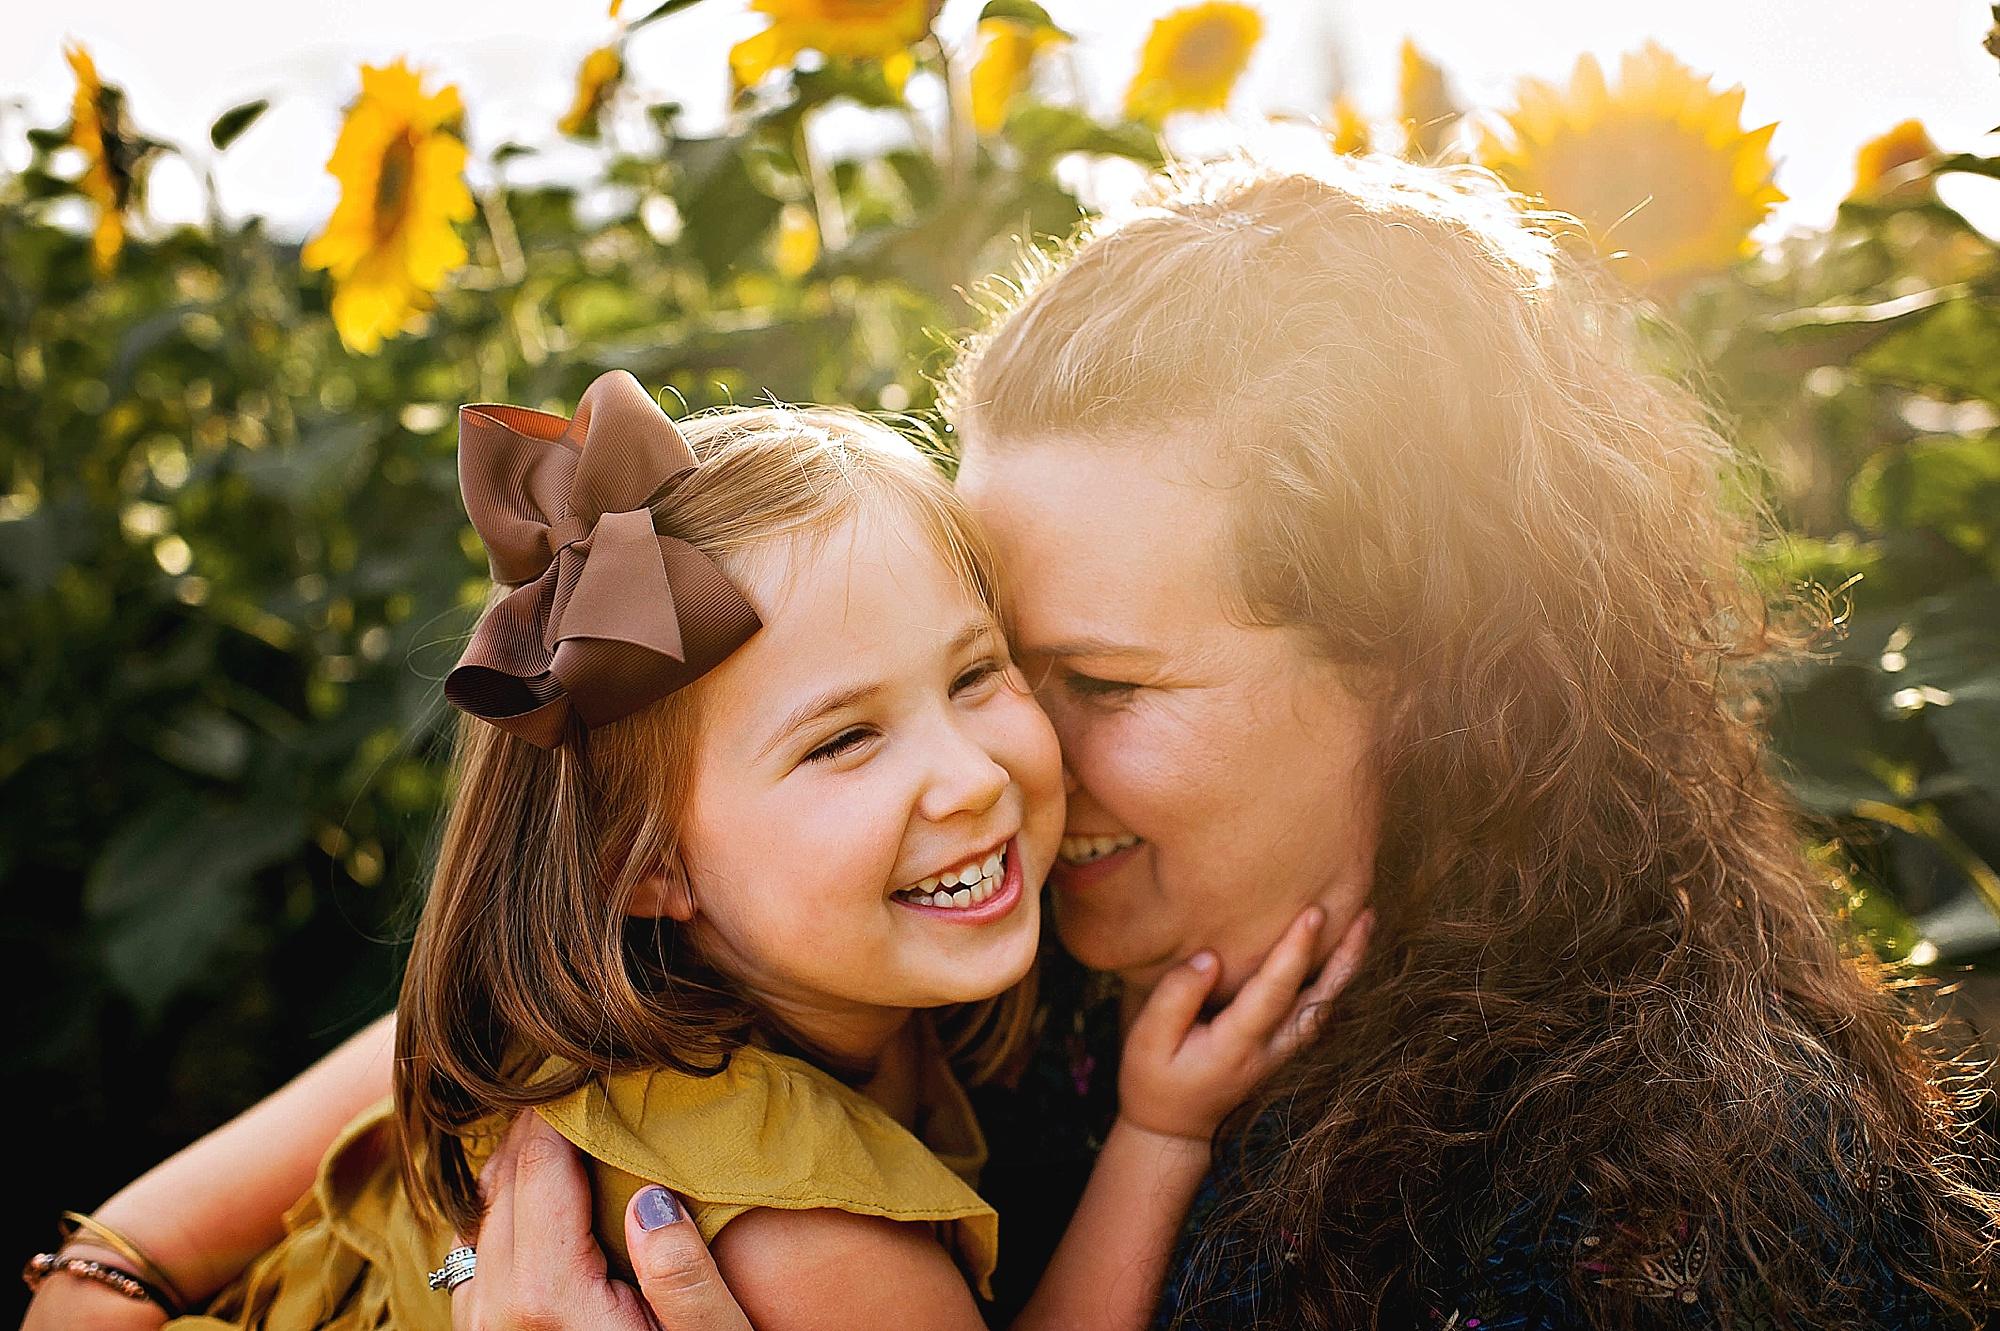 Rutherford-family-cleveland-photographer-lauren-grayson-sunflower-field-session_0013.jpg